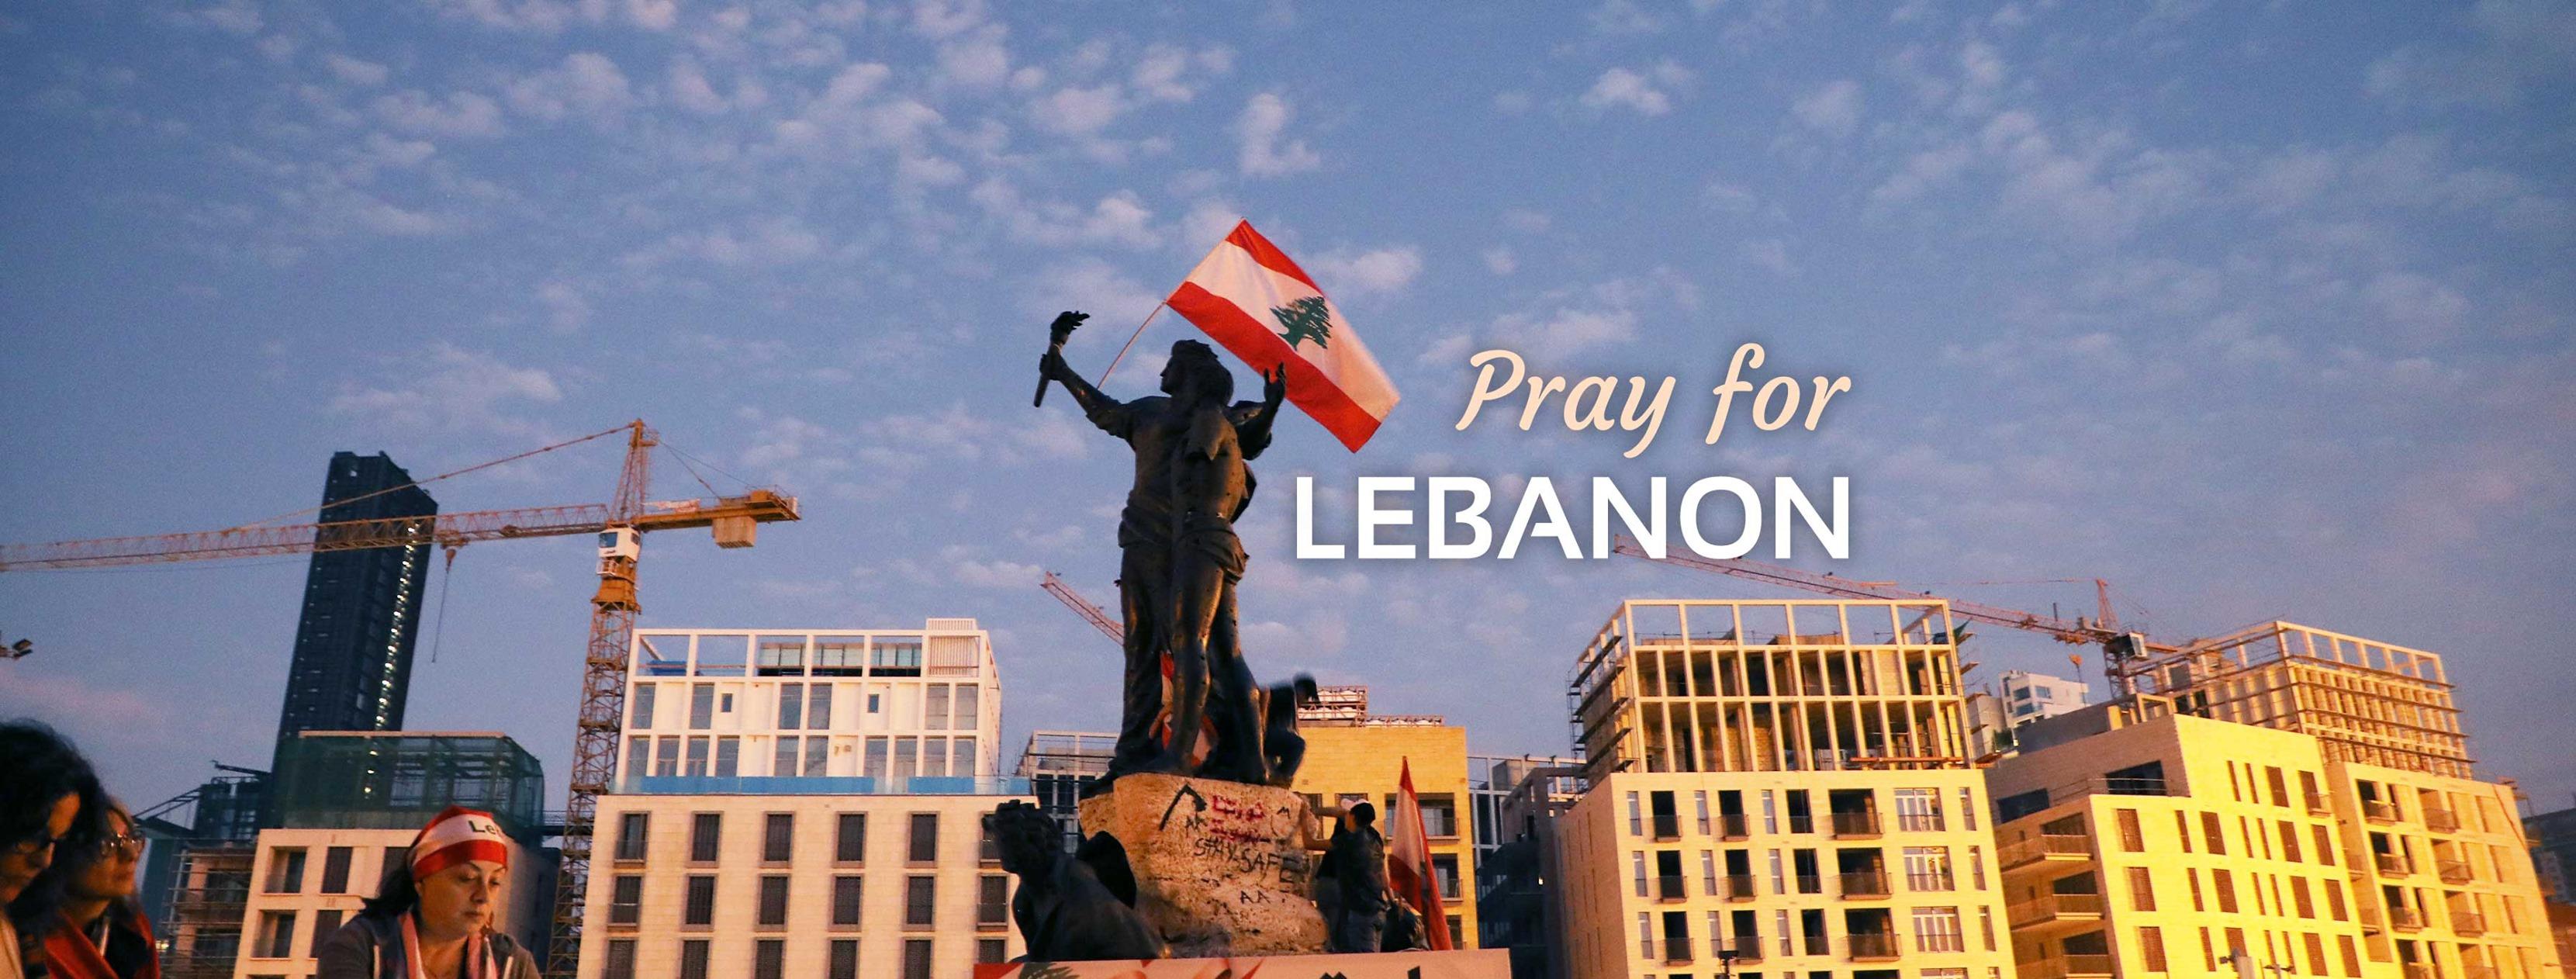 Days of unrest follow latest Lebanon lockdown